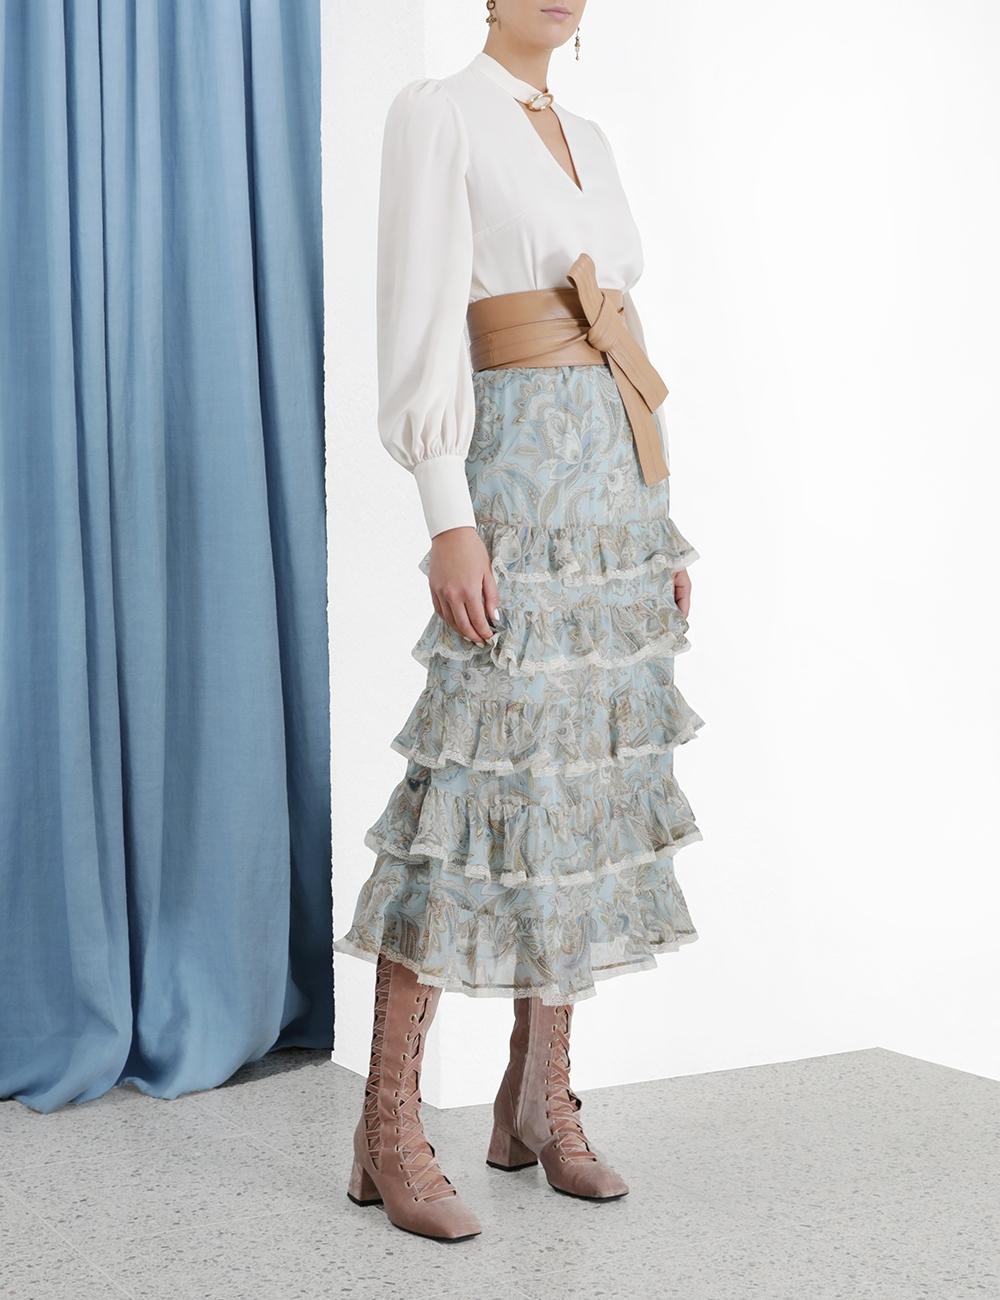 Ladybeetle Tiered Frill Skirt